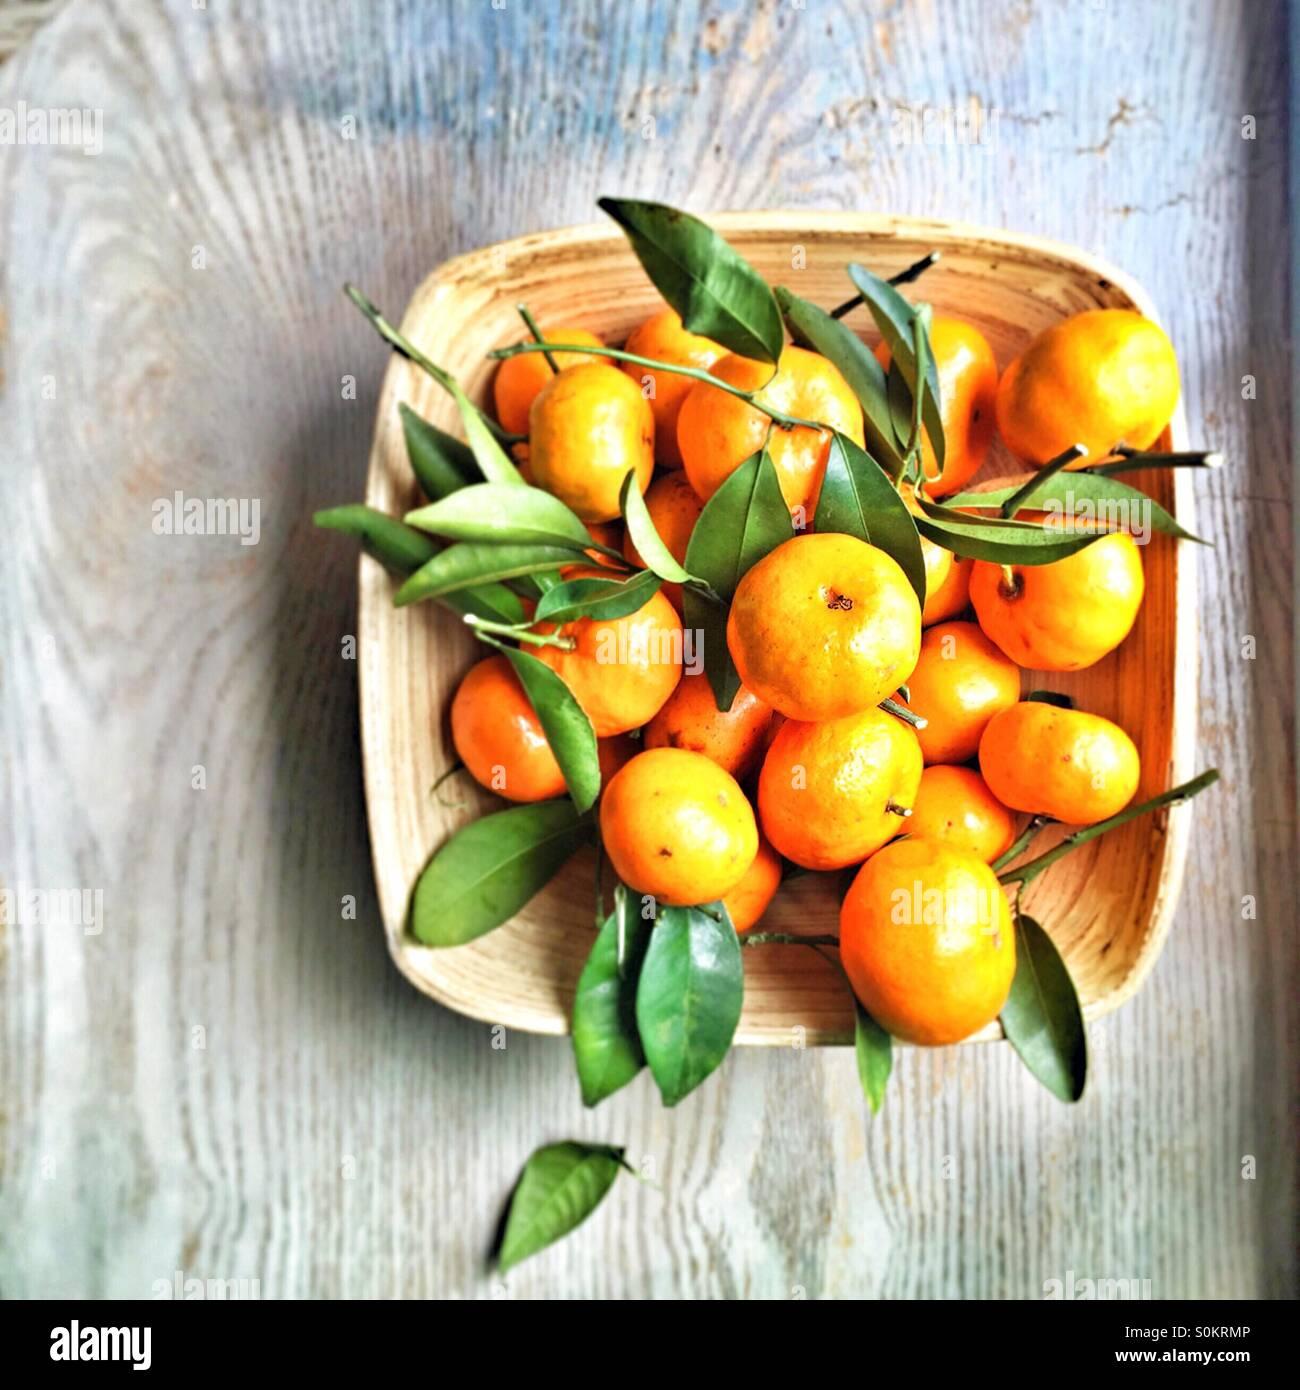 Cesta de naranjas Imagen De Stock